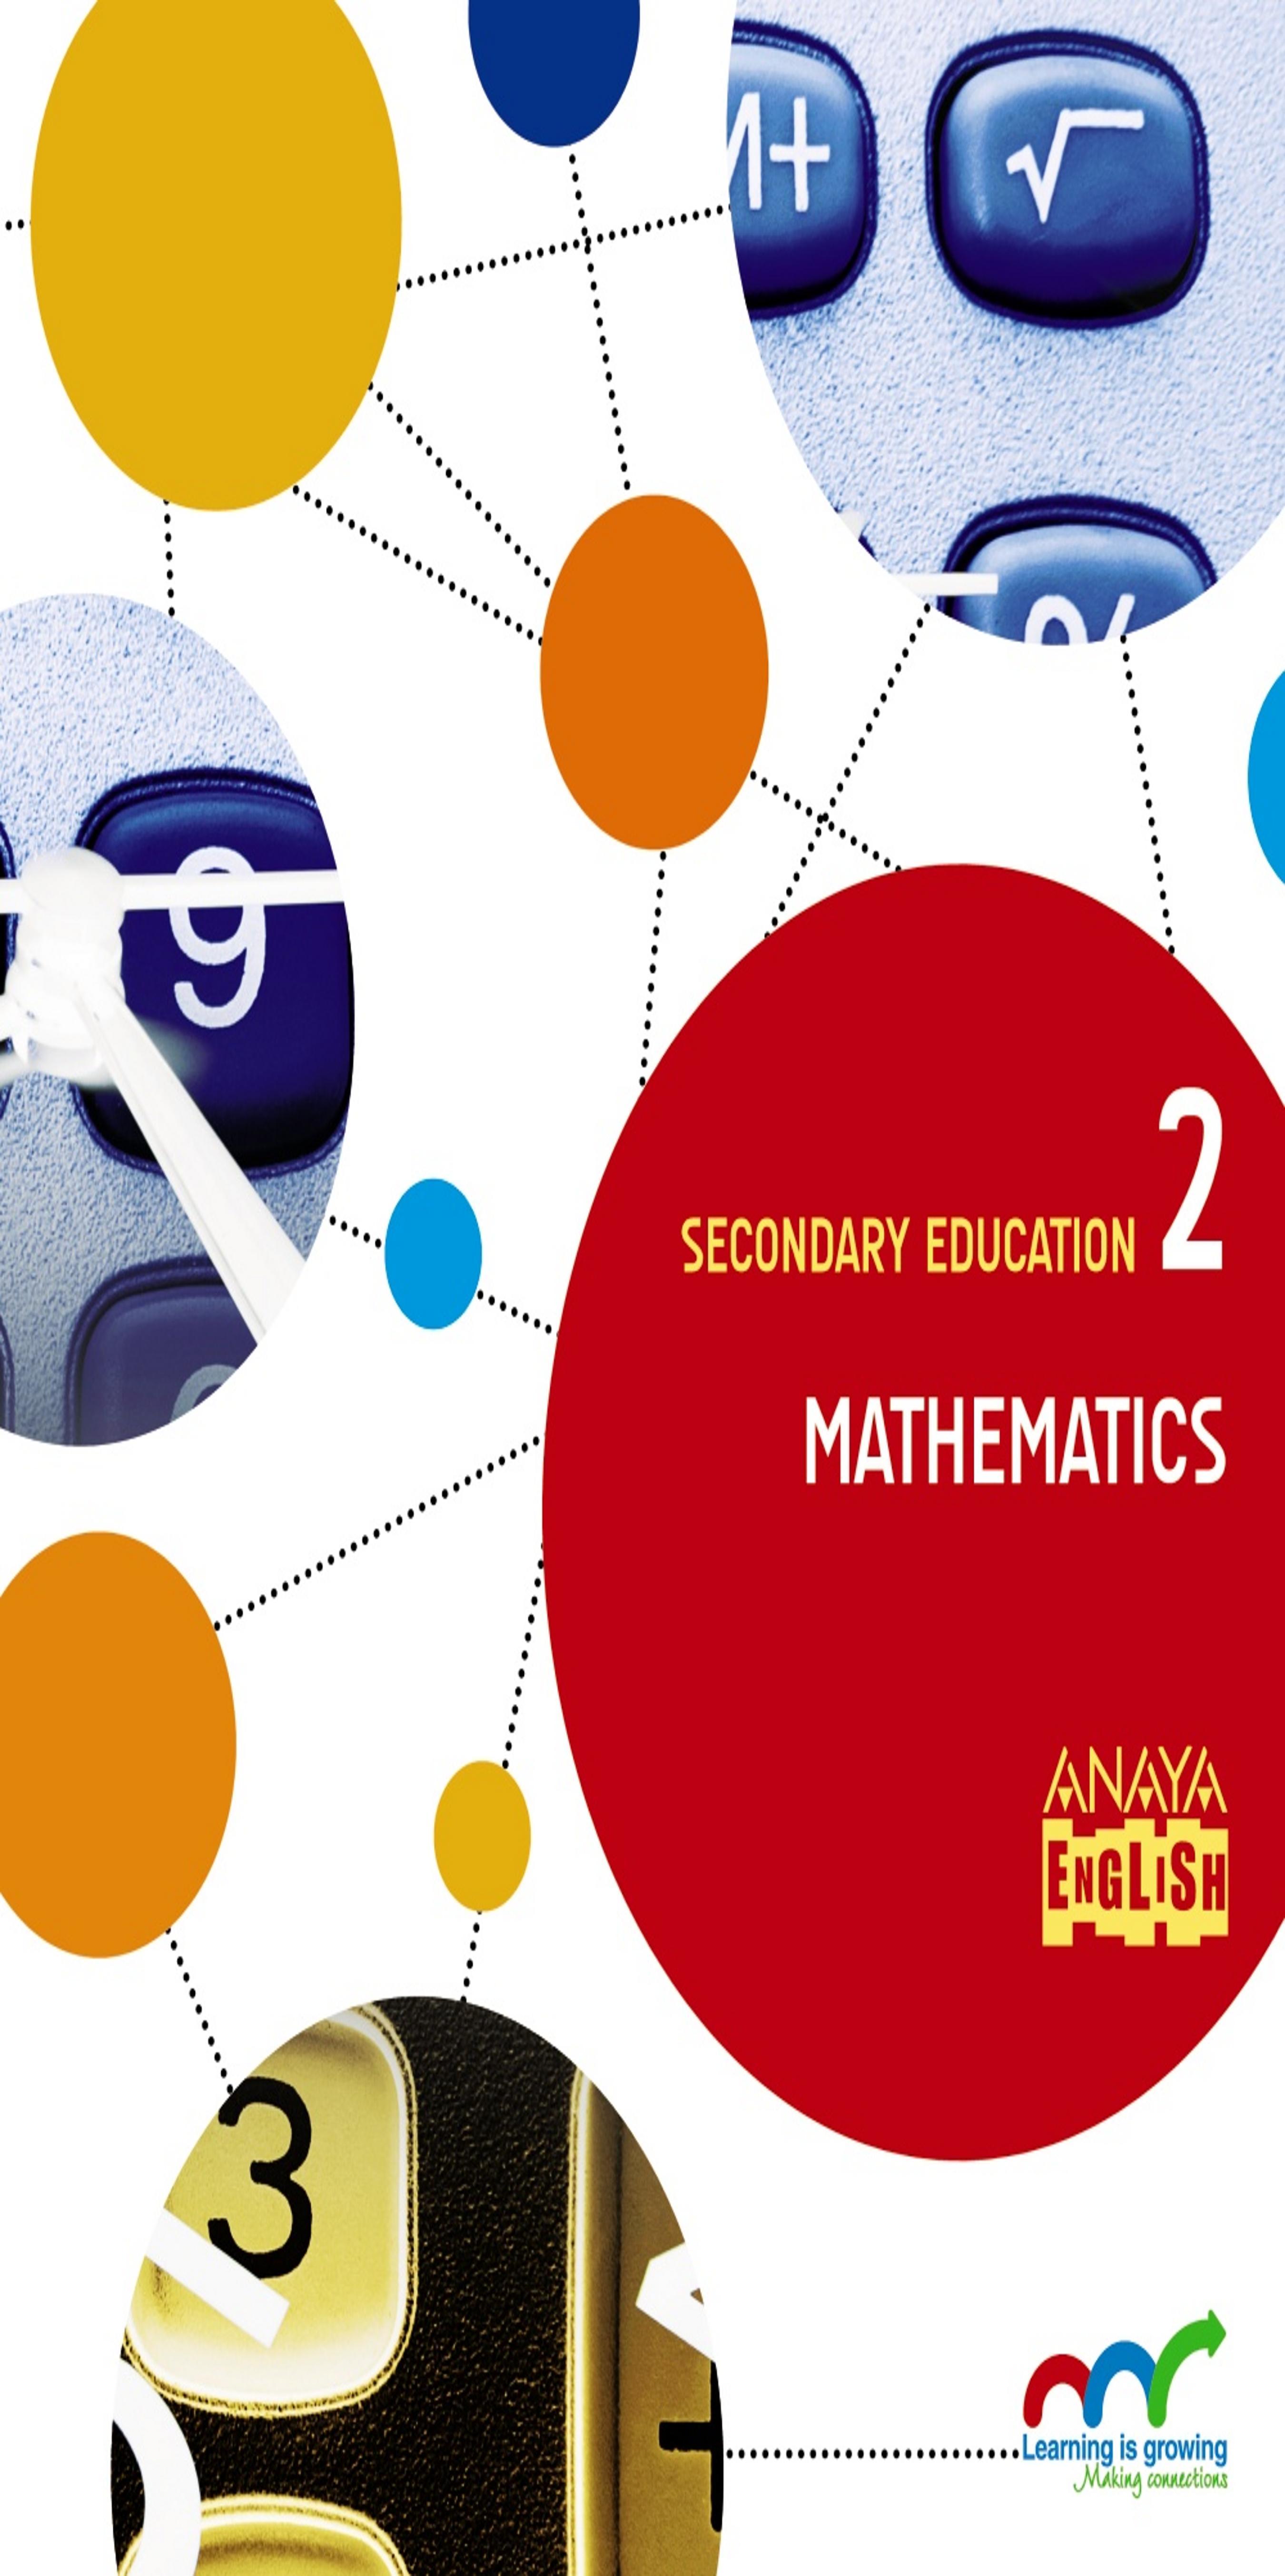 MATHEMATICS 2º ESO - Secondary Education